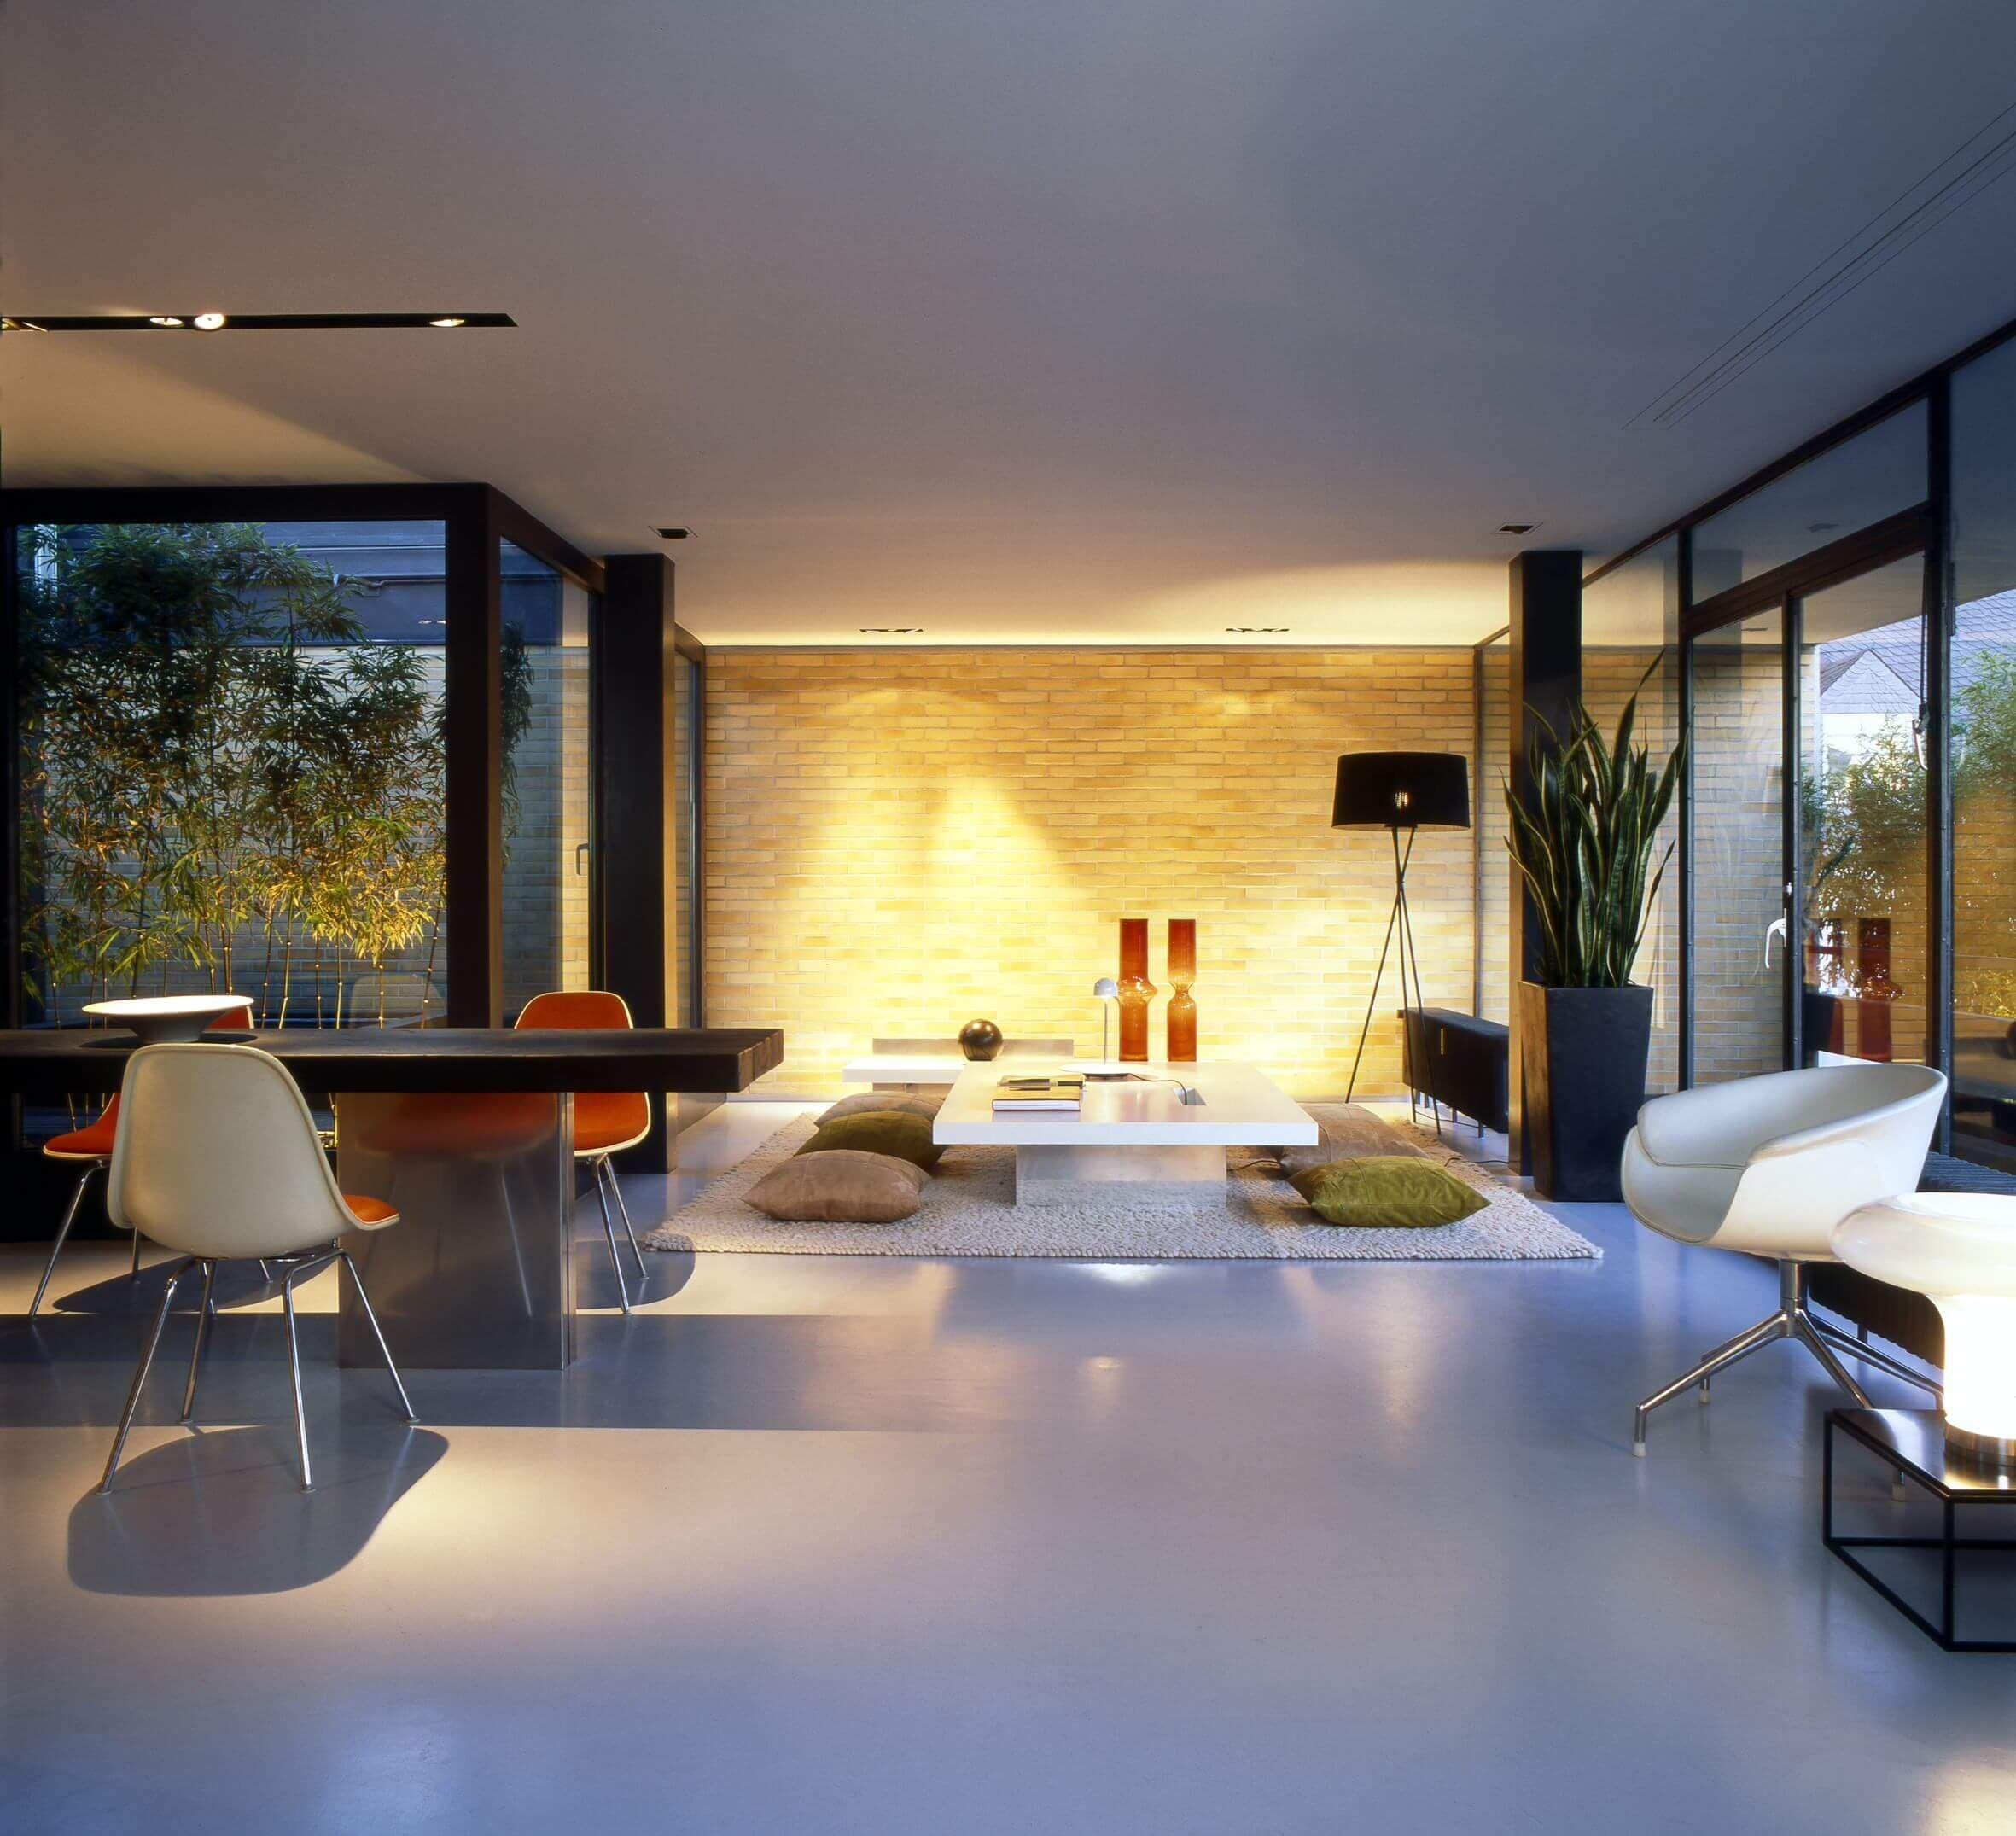 penthouse b27 by hollin radoske architekten interiorismo rh pinterest com